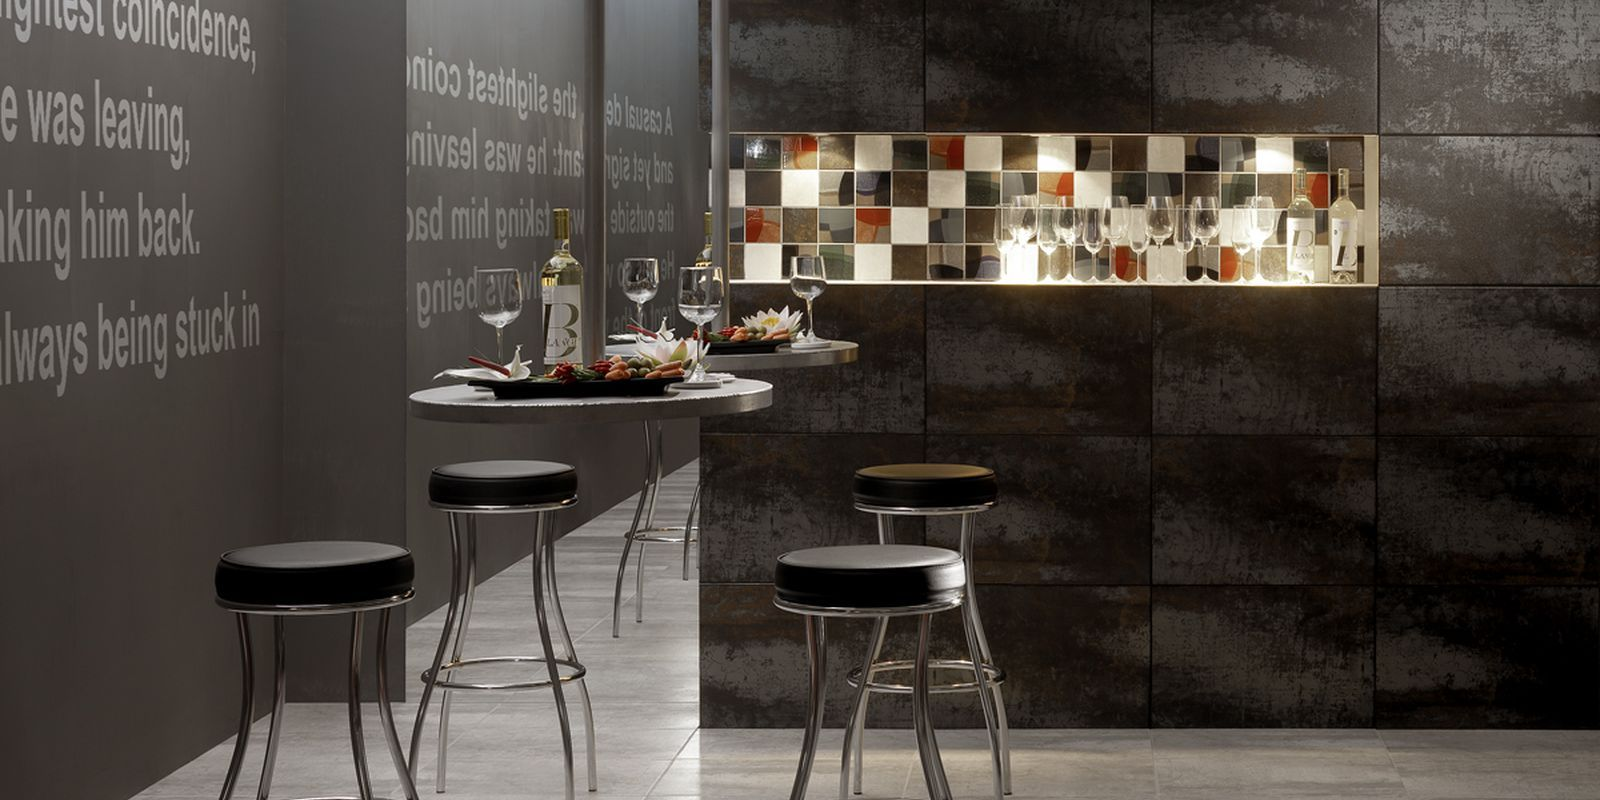 Imola Antares Point P Credence Cuisine Cuisines Design Cuisine Carreaux De Ciment